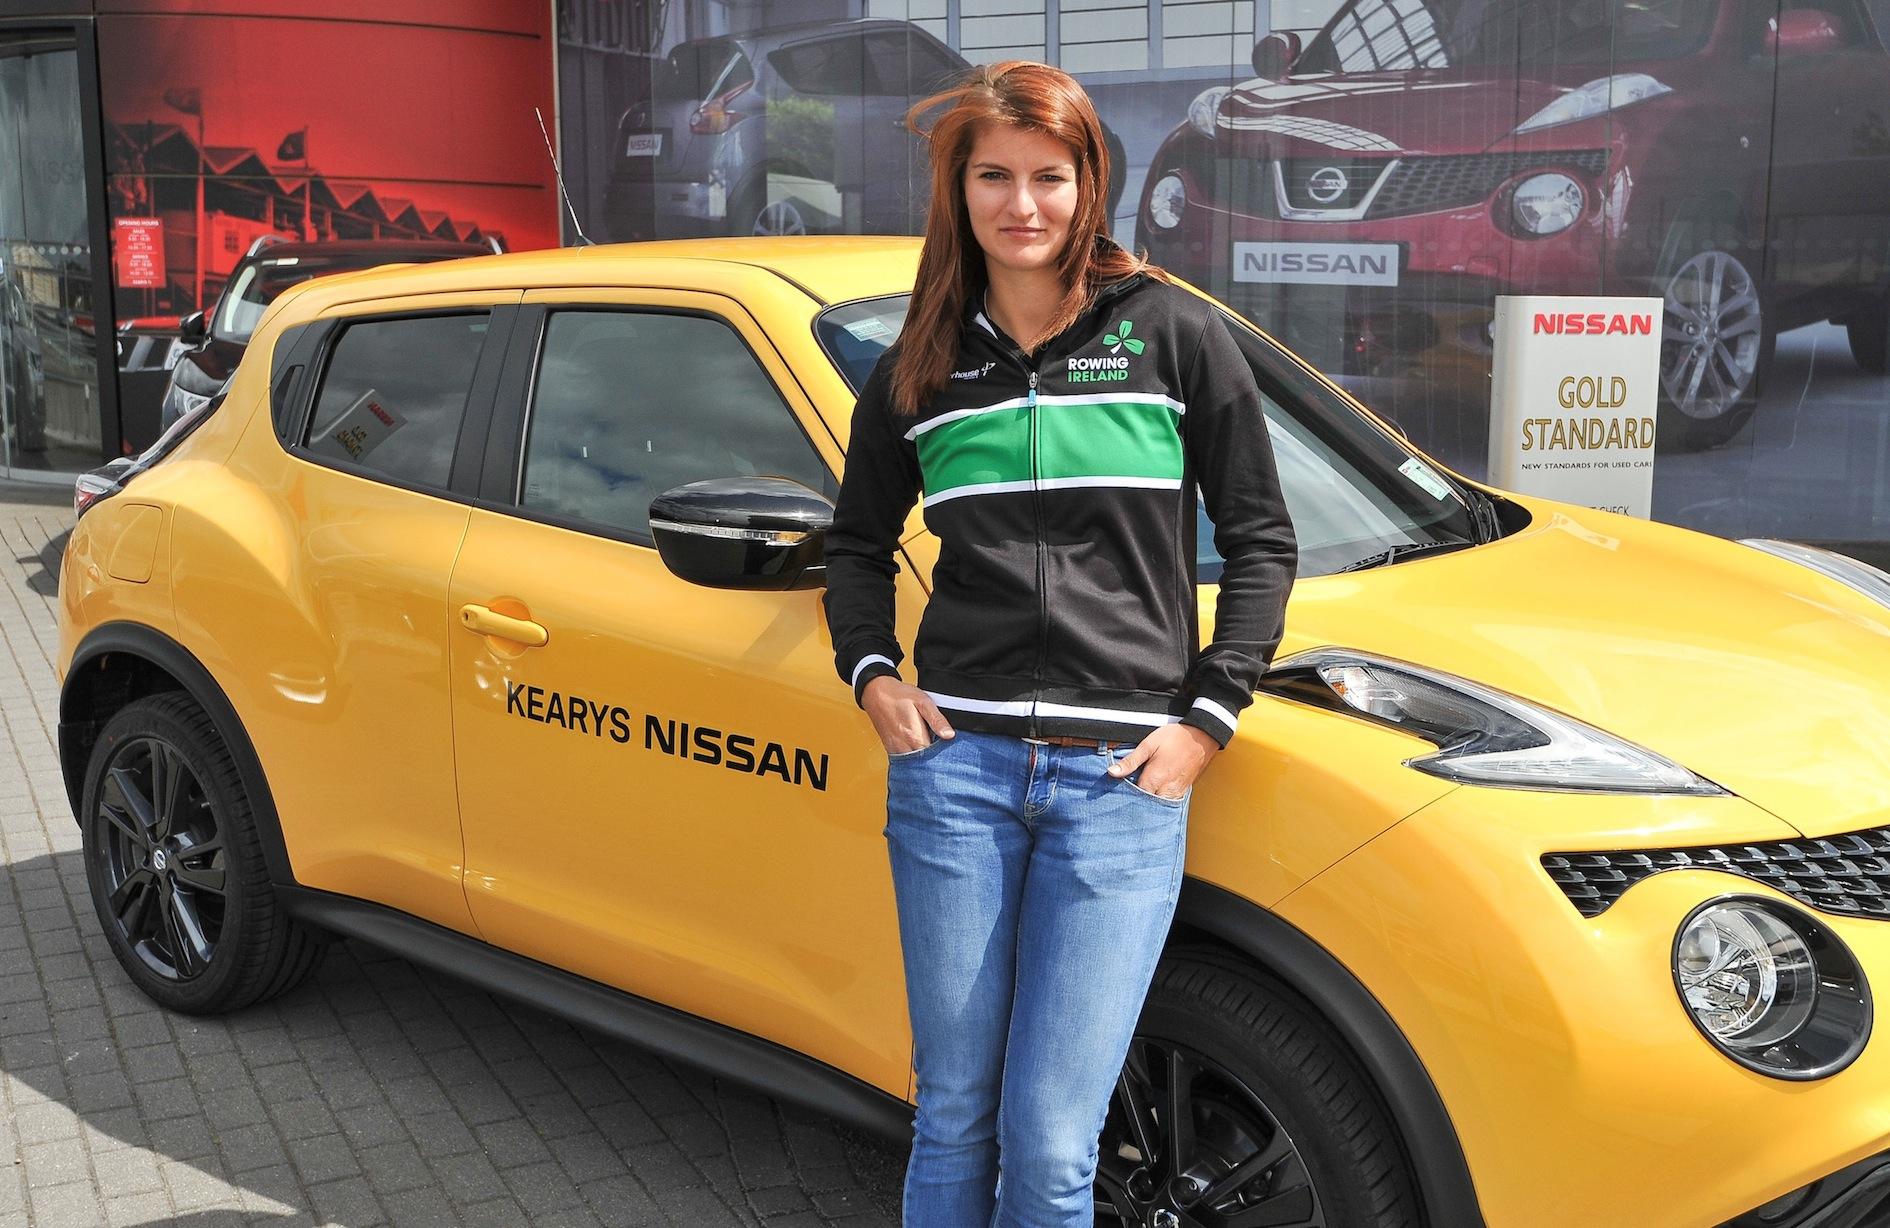 Irish senior rowing high performance team member Monika Dukarska. PICTURE: DAVID KEANE